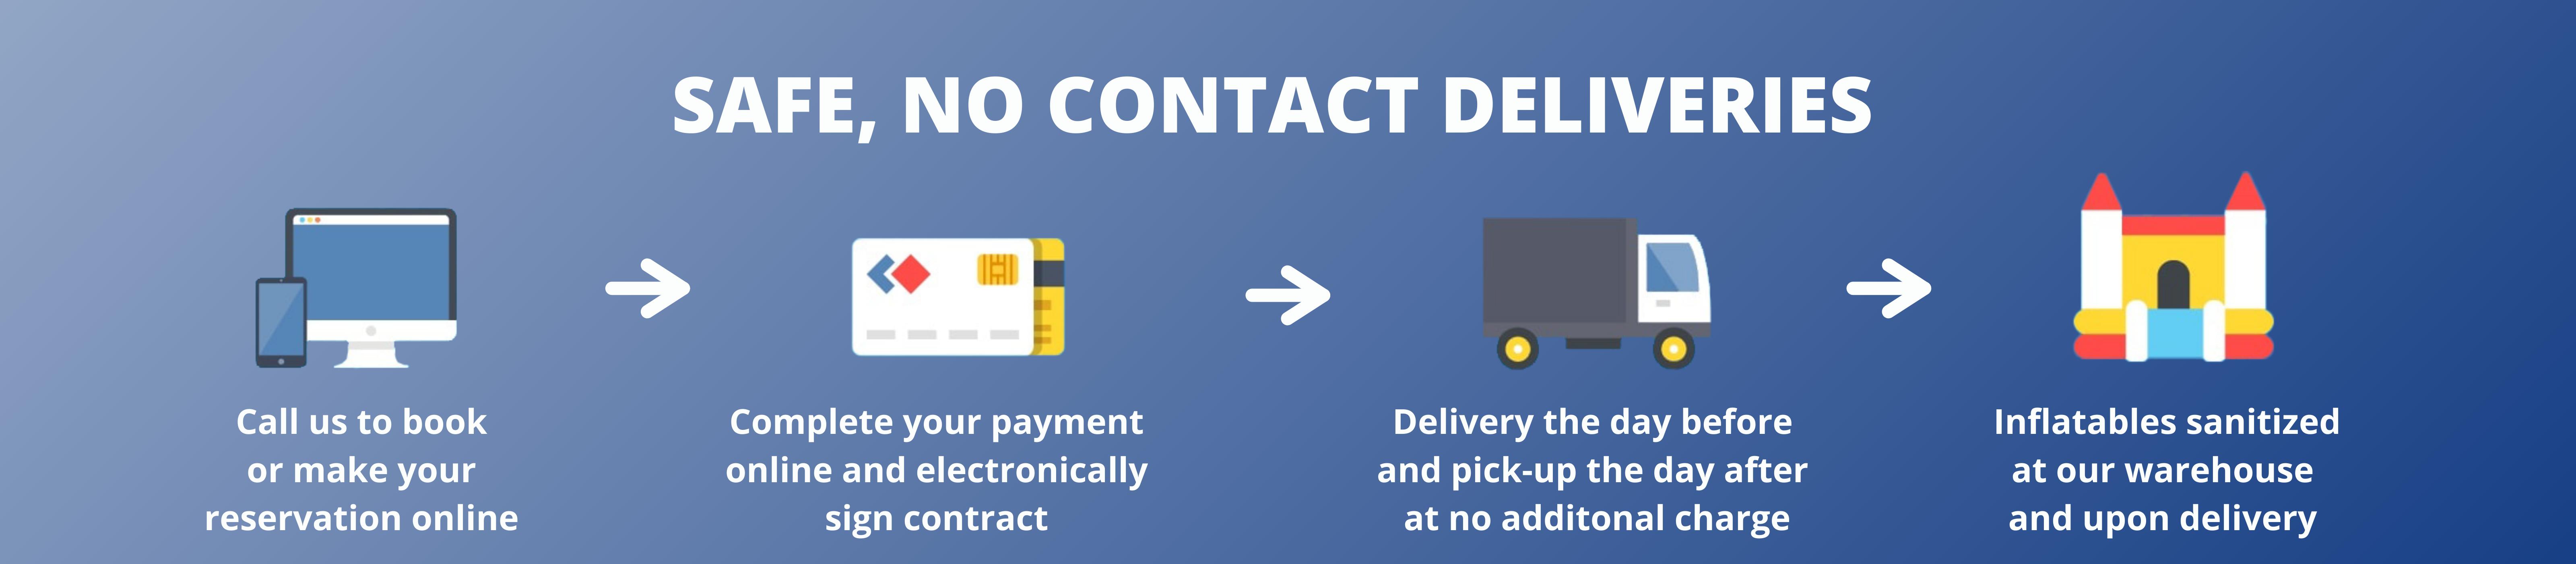 safe no contact deliveries